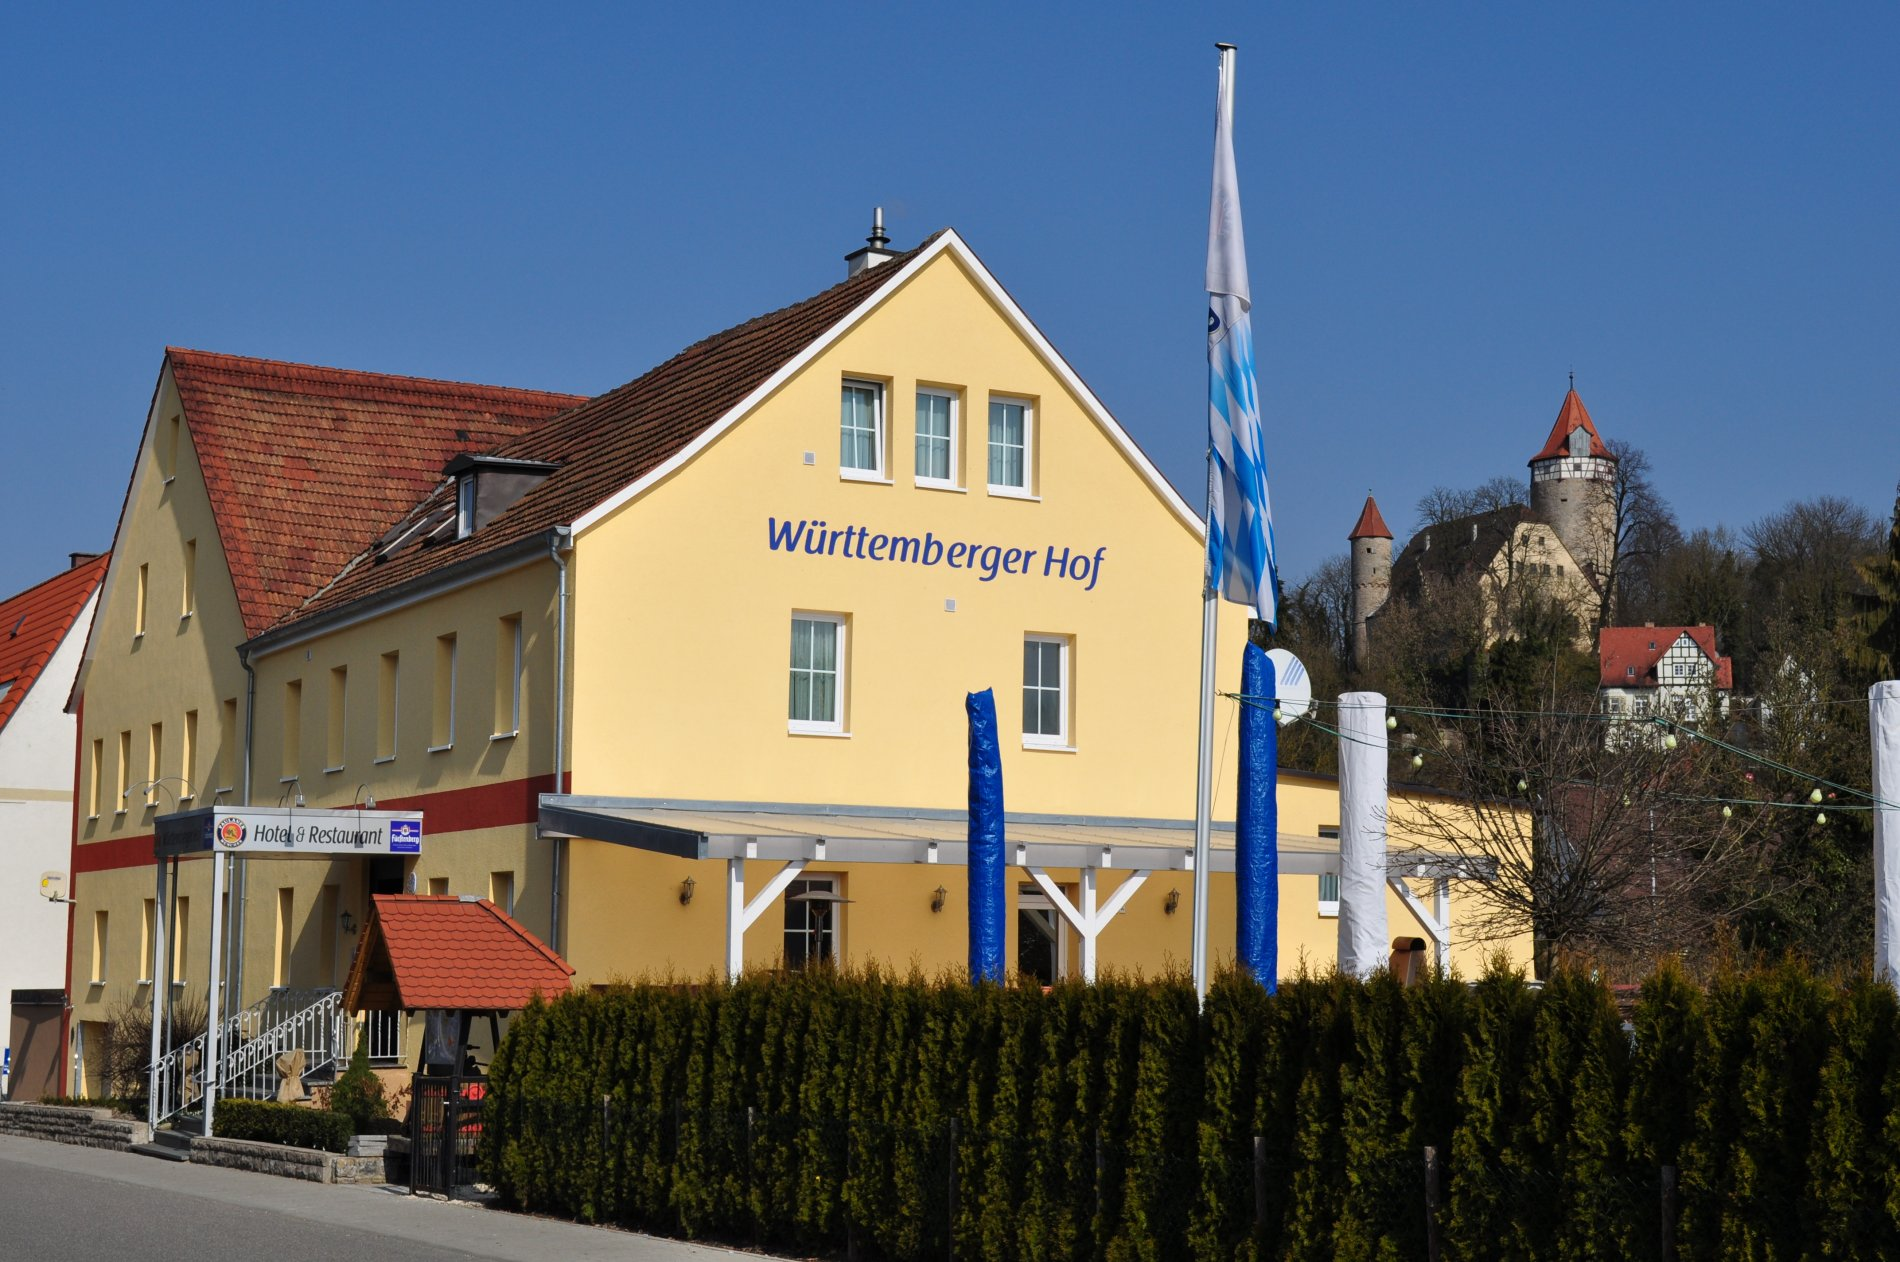 Hotel Restaurant Württemberger Hof | Möckmühl | HeilbronnerLand